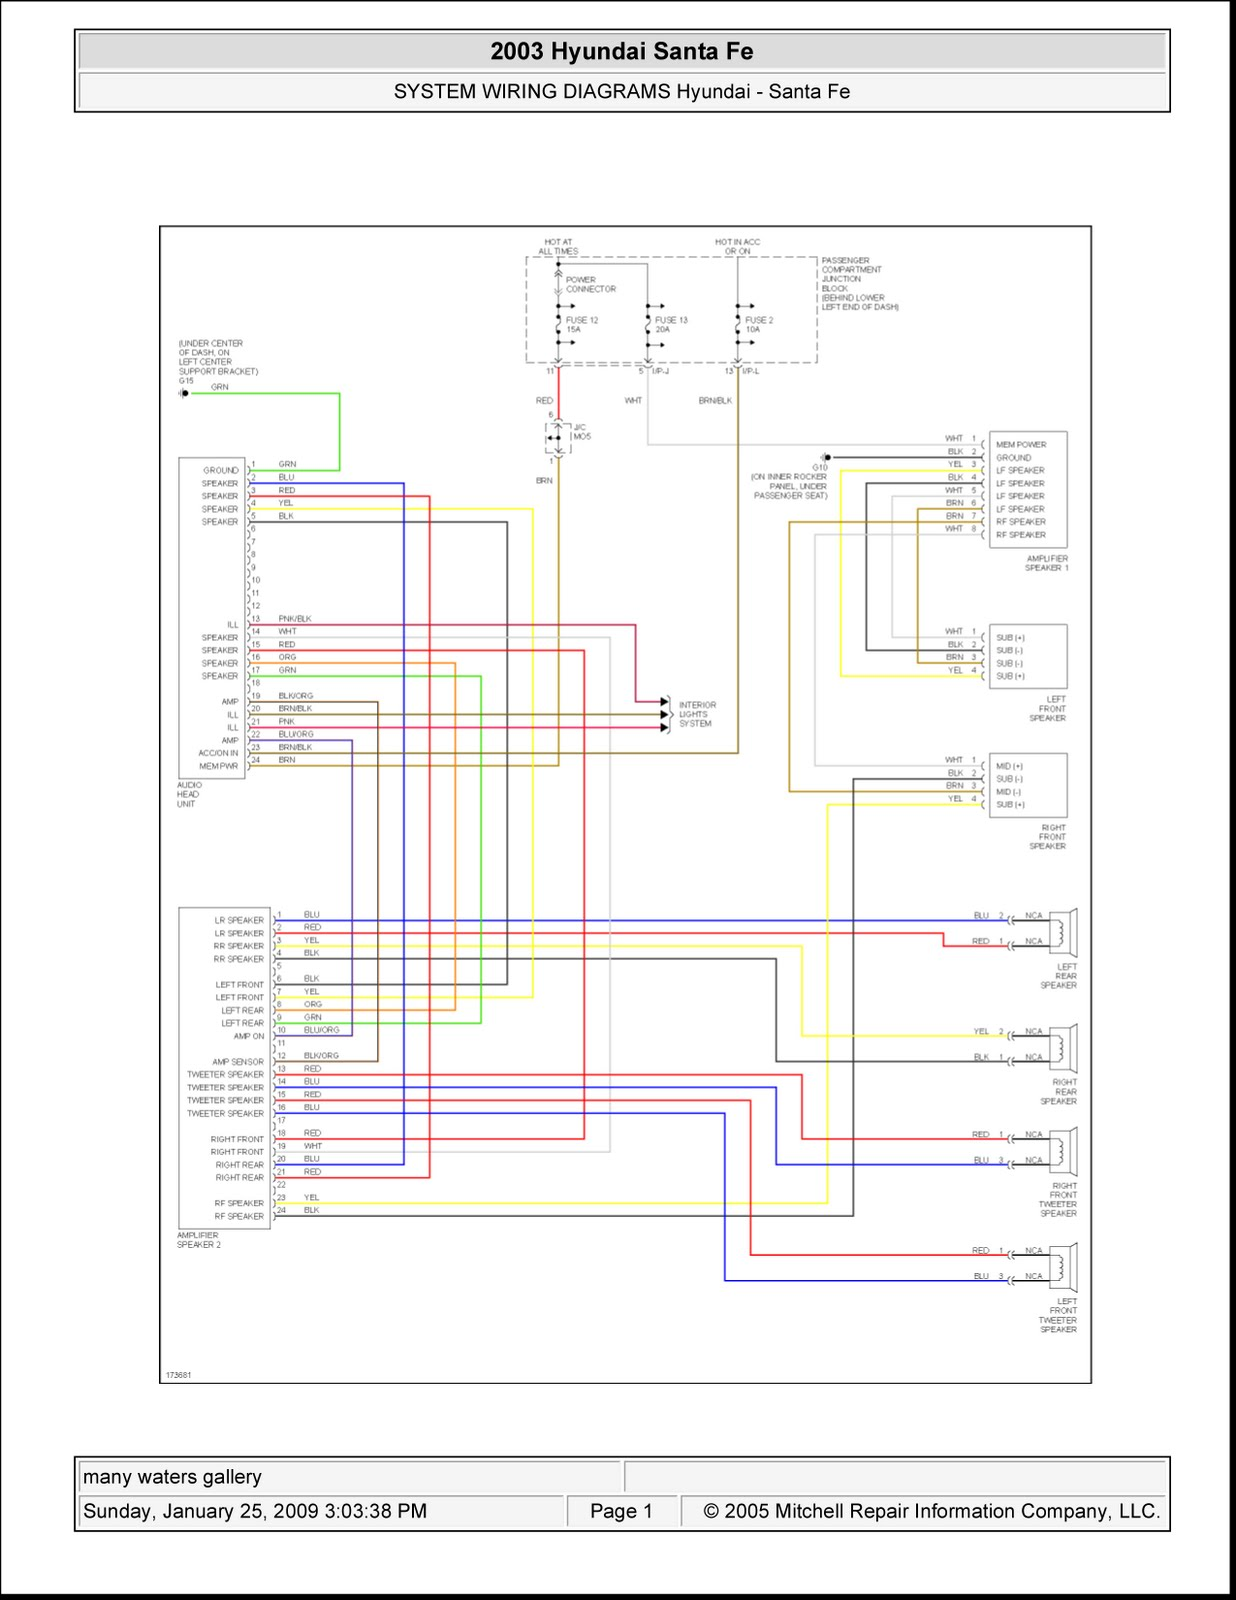 Magnificent Pontiac G6 Radio Wiring Diagram Photos - Electrical ...